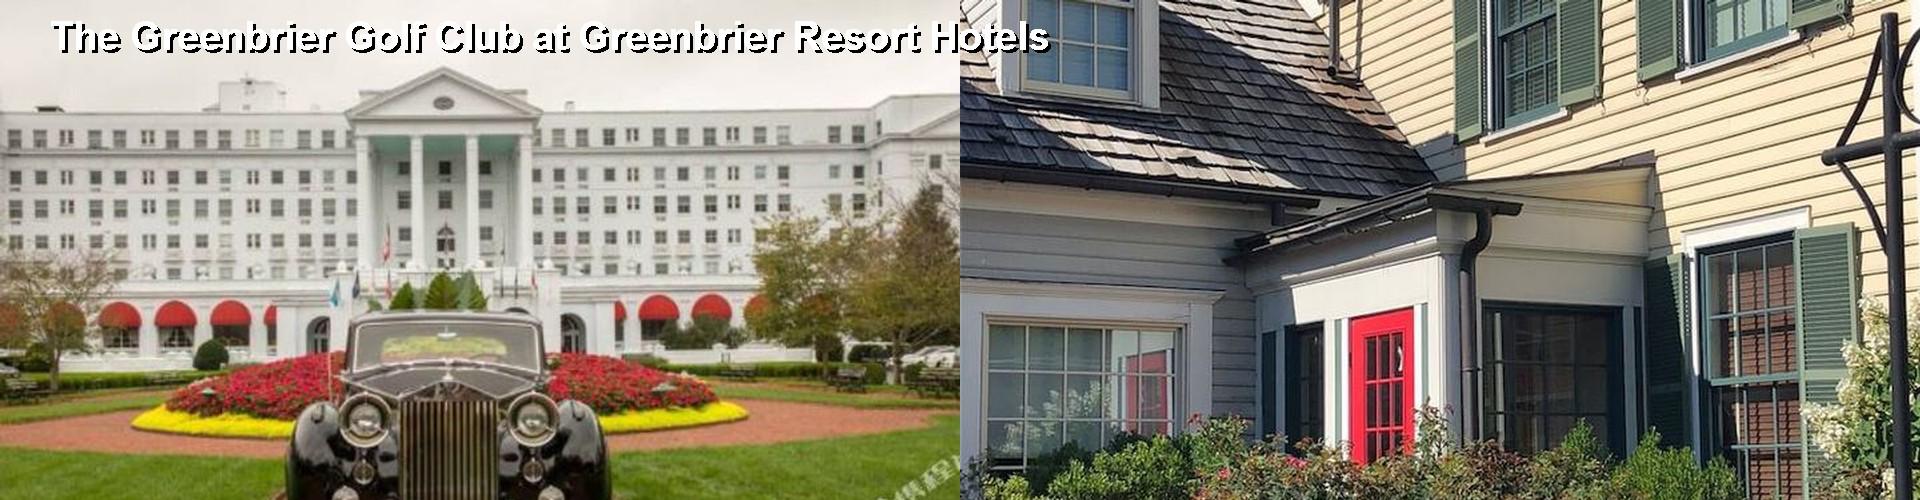 3 Best Hotels Near The Greenbrier Golf Club At Resort